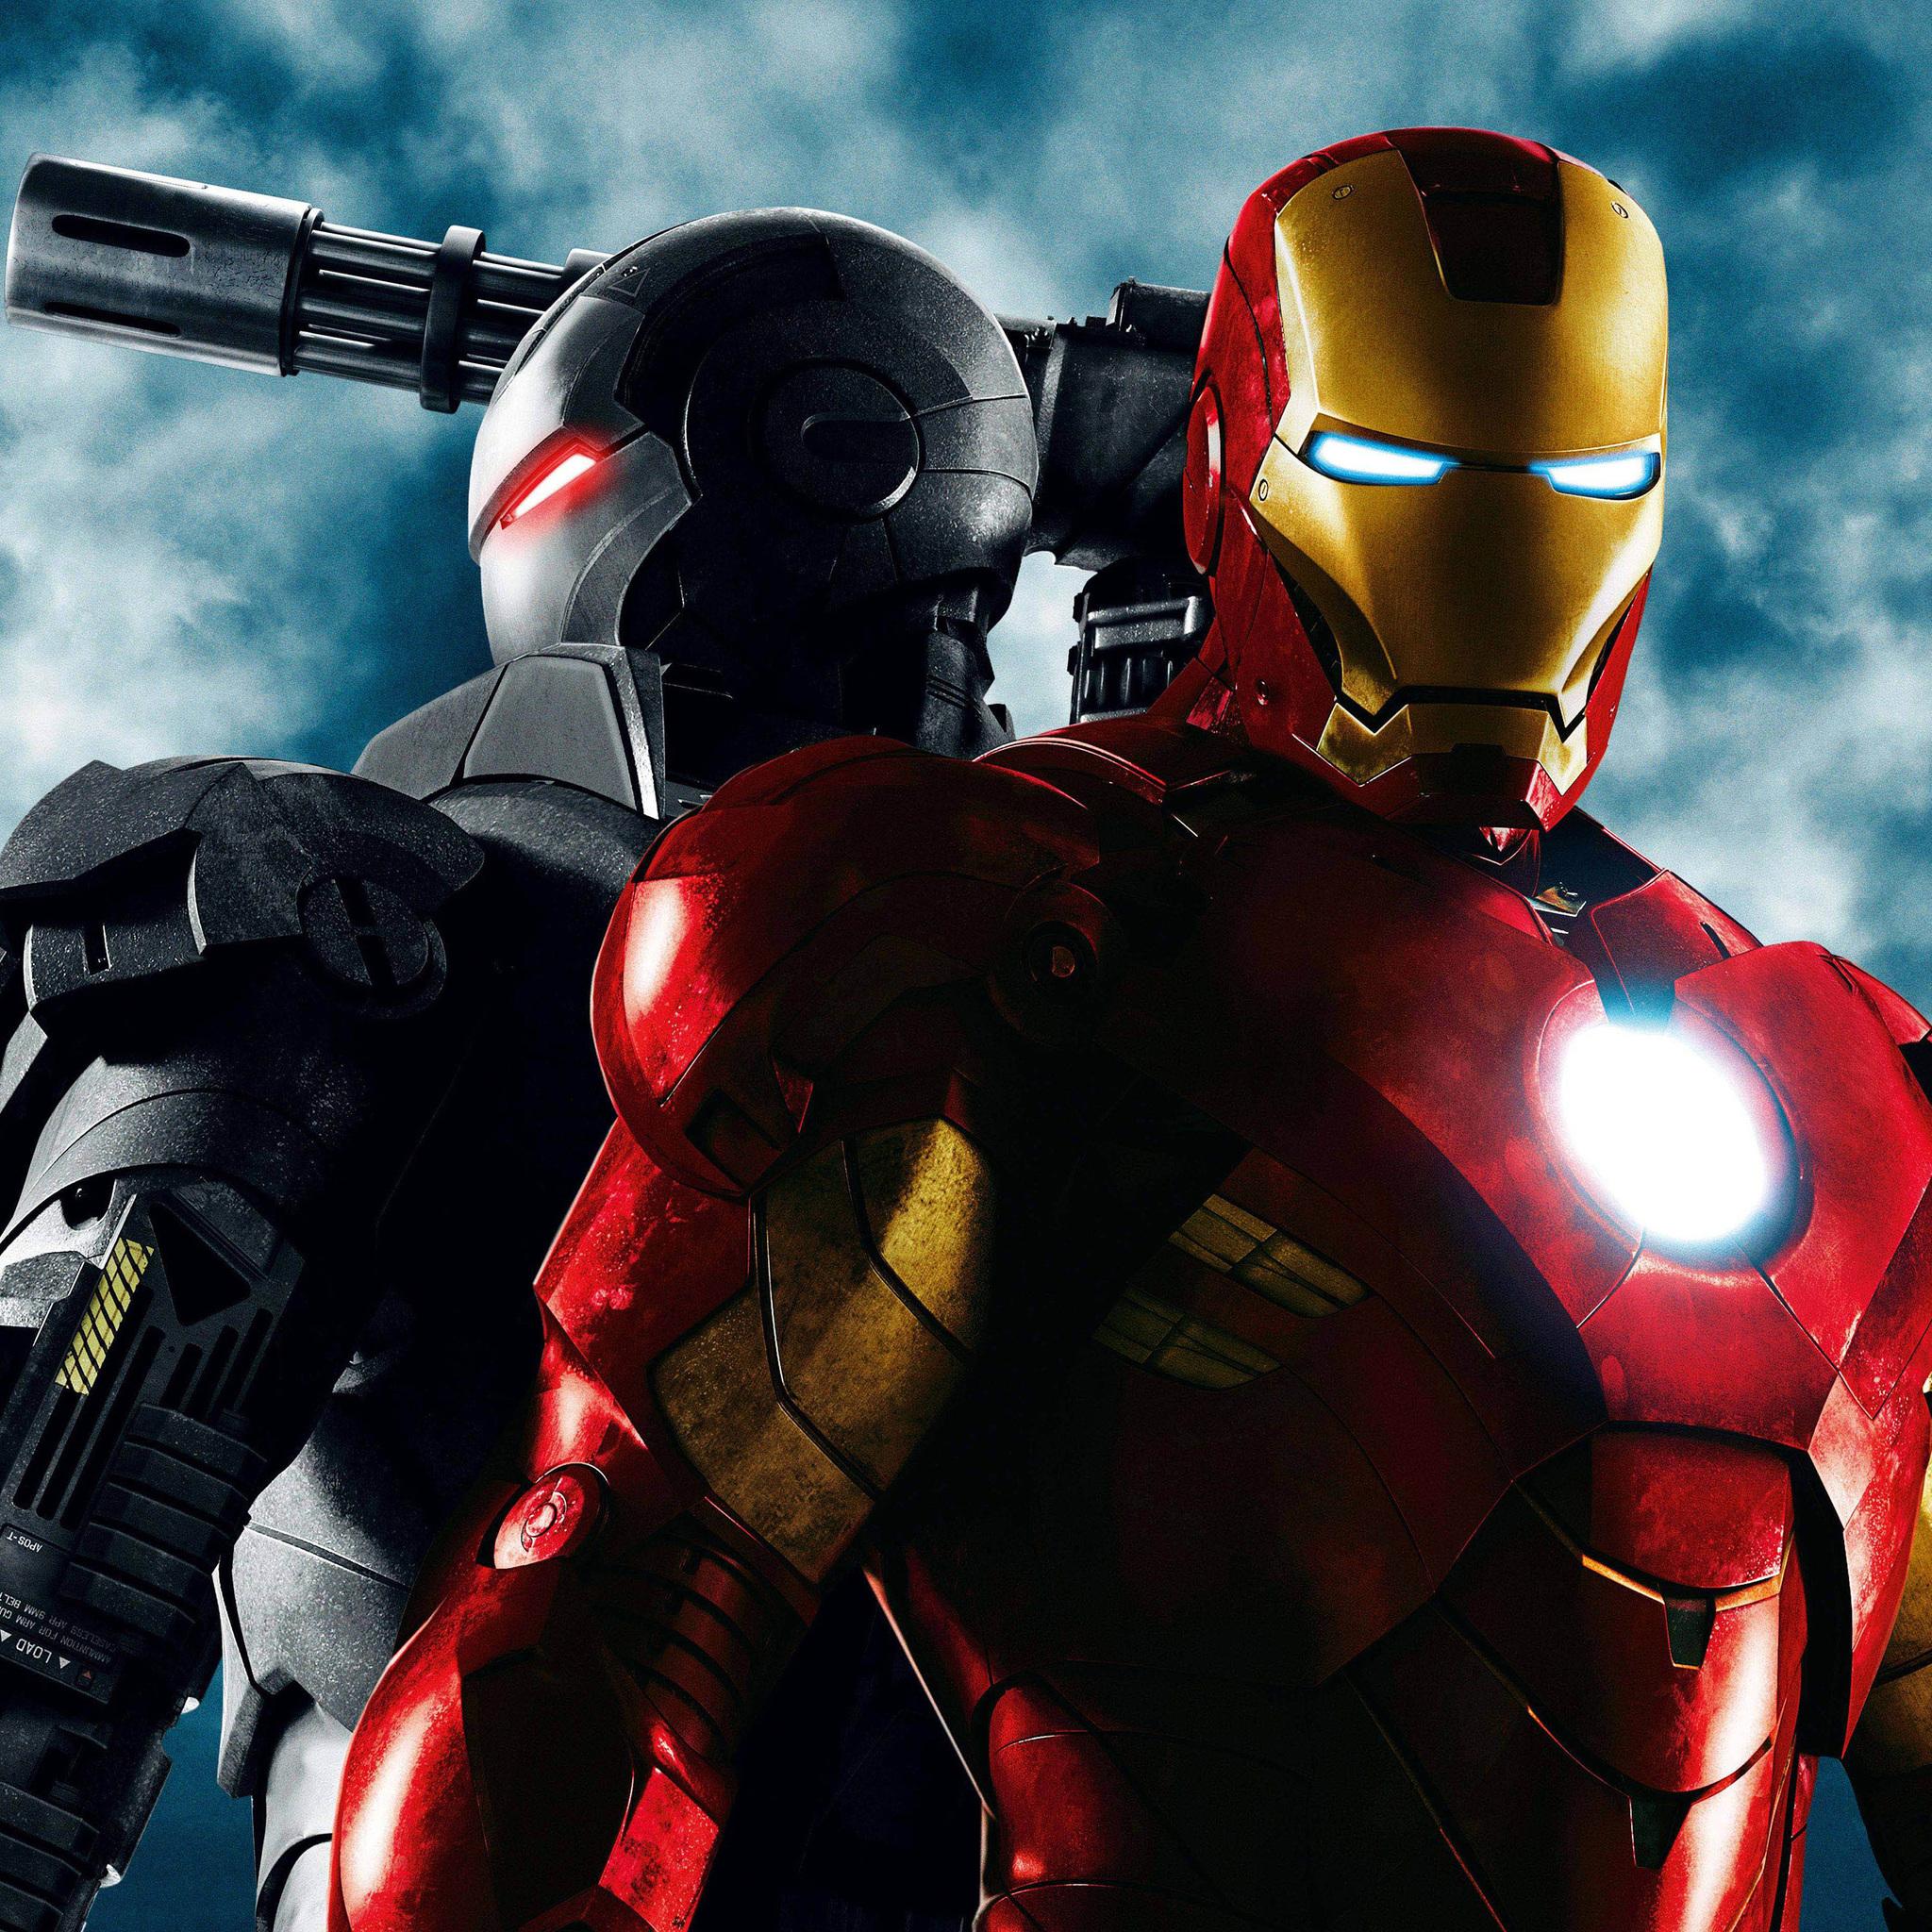 2048x2048 Iron Man 2 4k Ipad Air Hd 4k Wallpapers Images